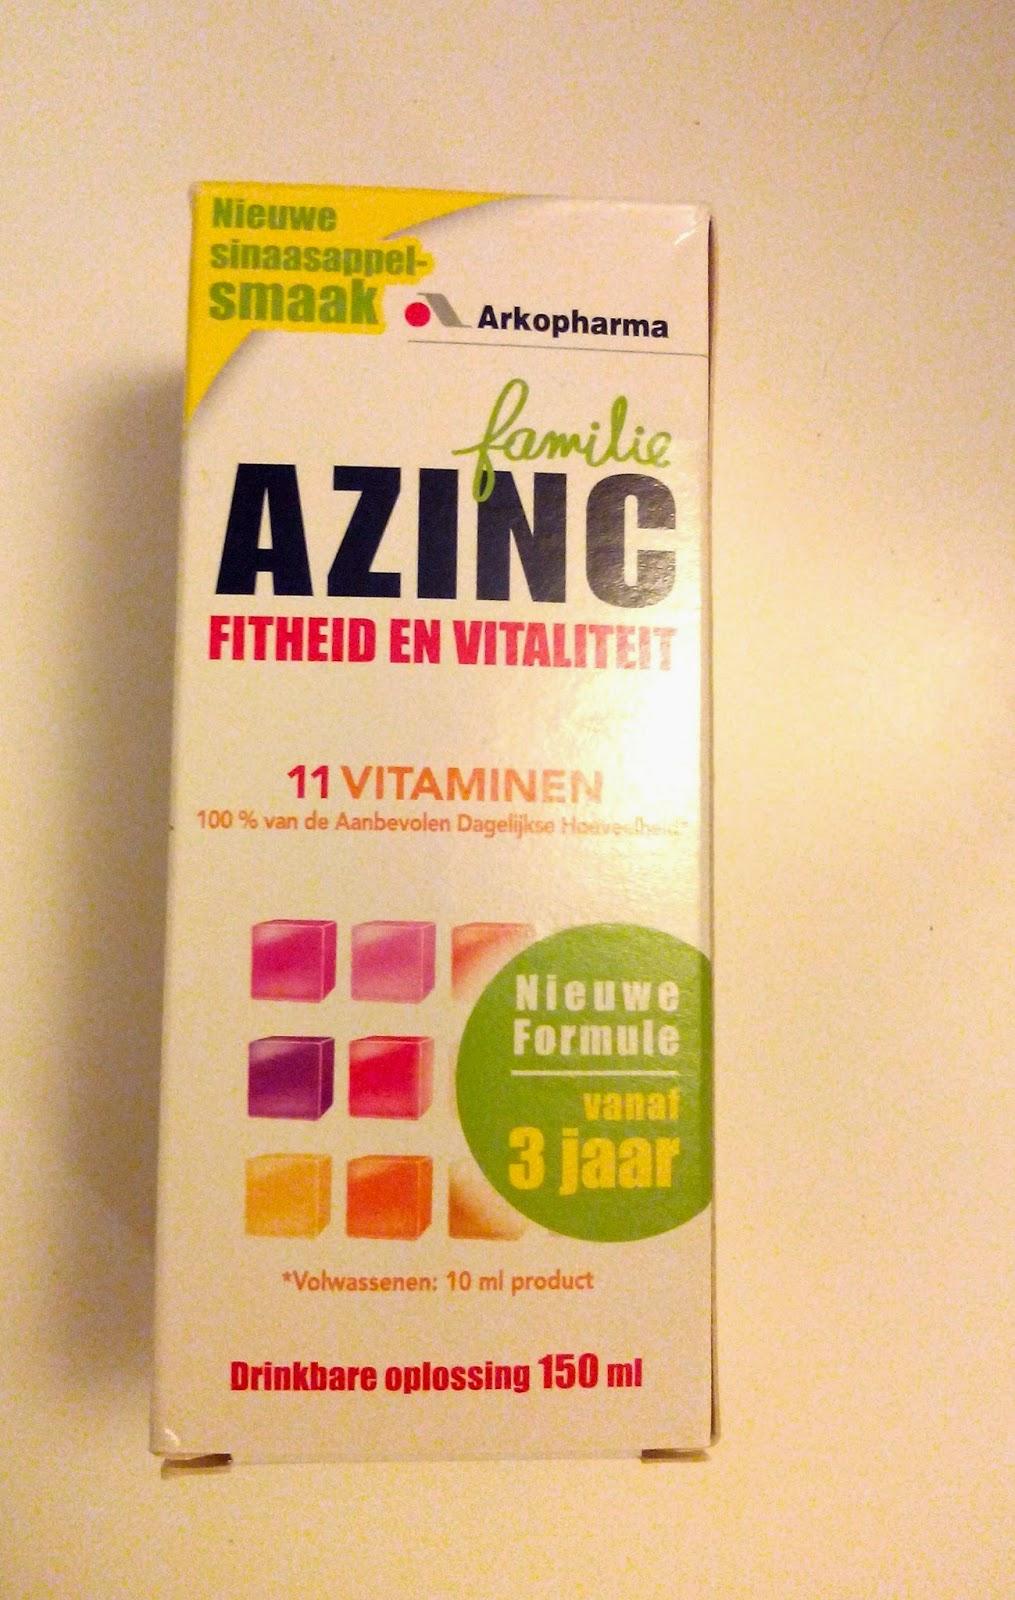 azinc, vitamines, cure, sirop, laboratoires arkopharma, bullelodie